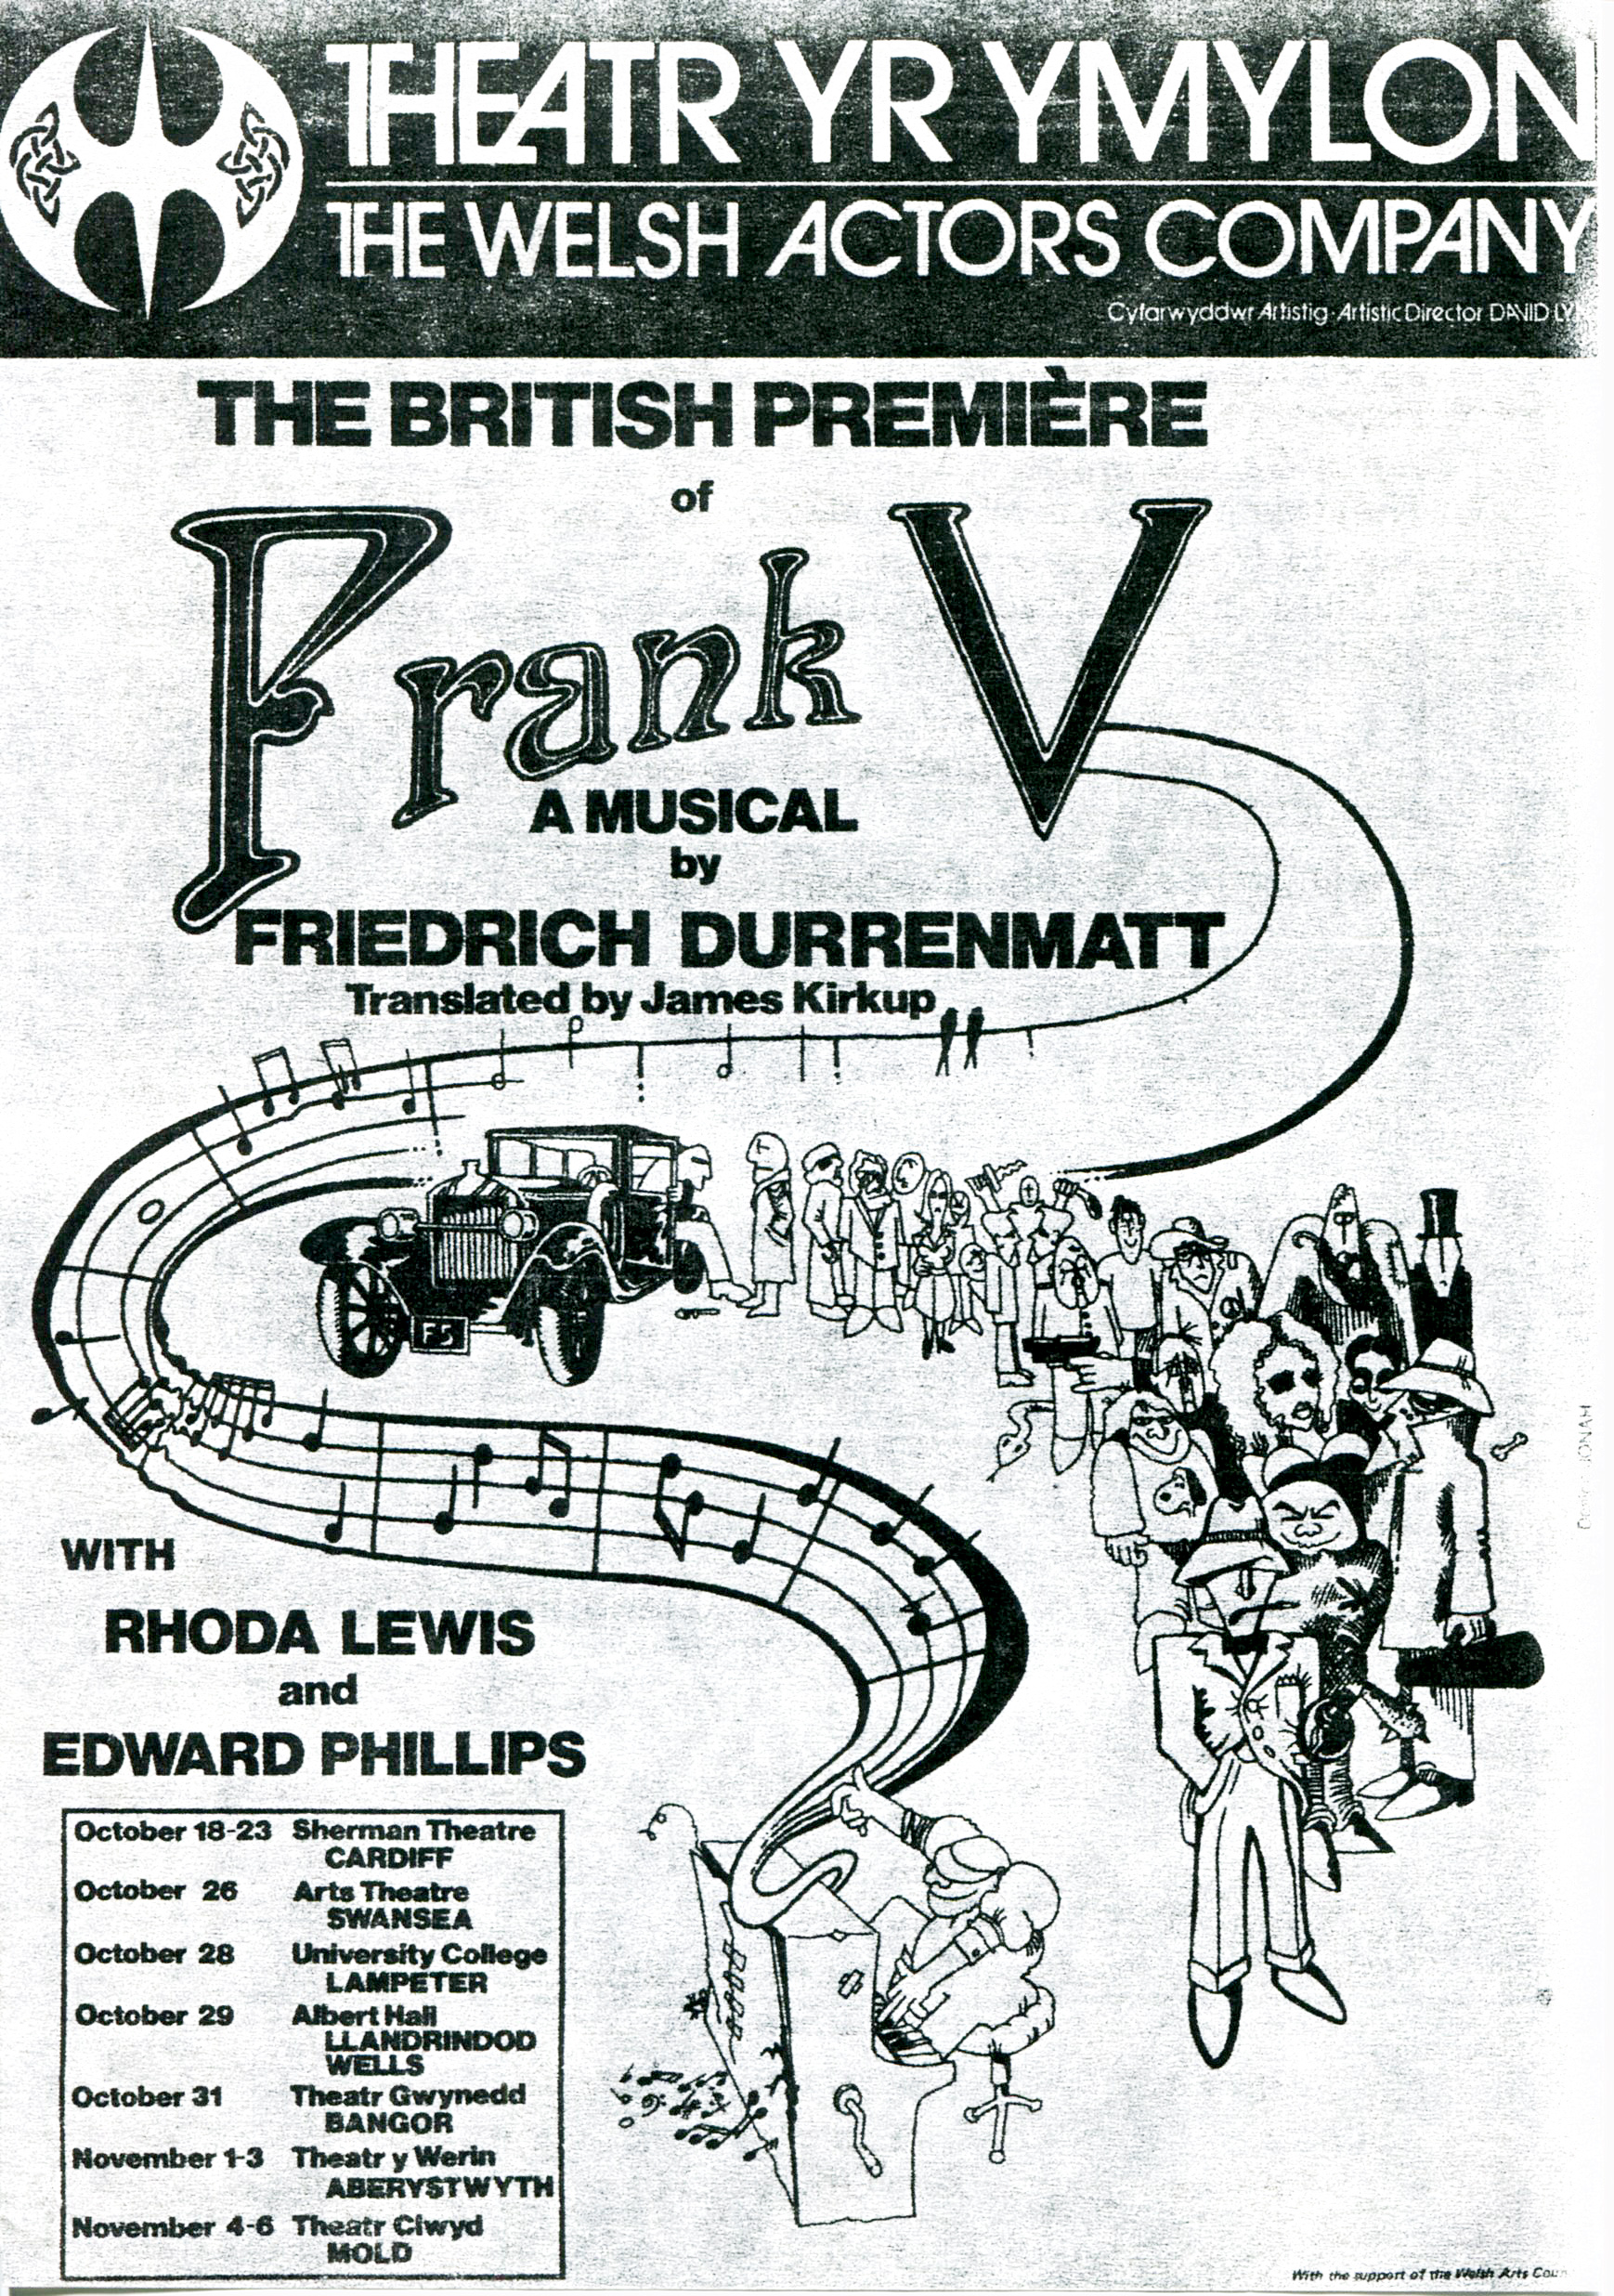 Frank v - flyer.jpg